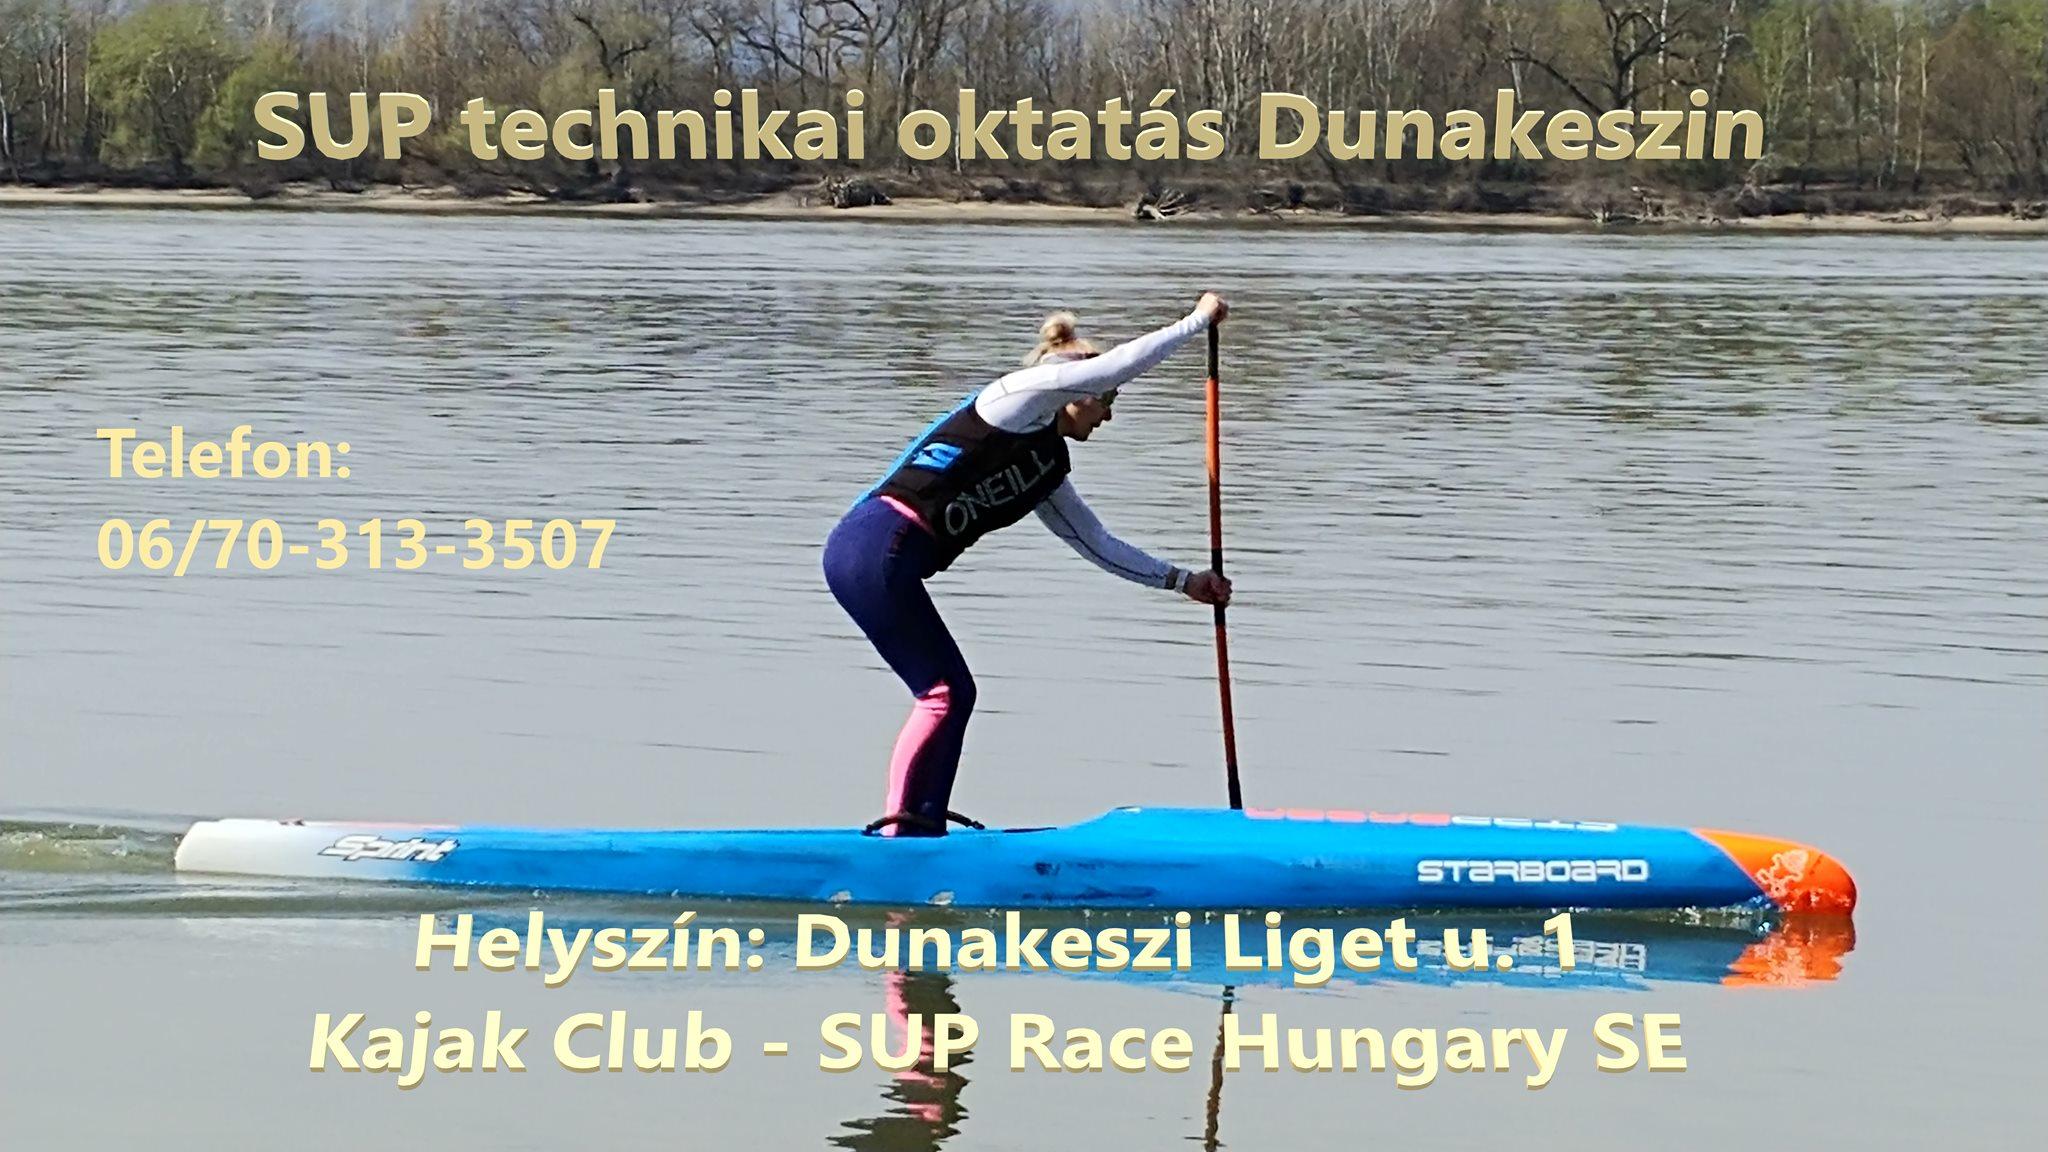 SUP technikai oktatás Dunakeszin - SUPlife.hu